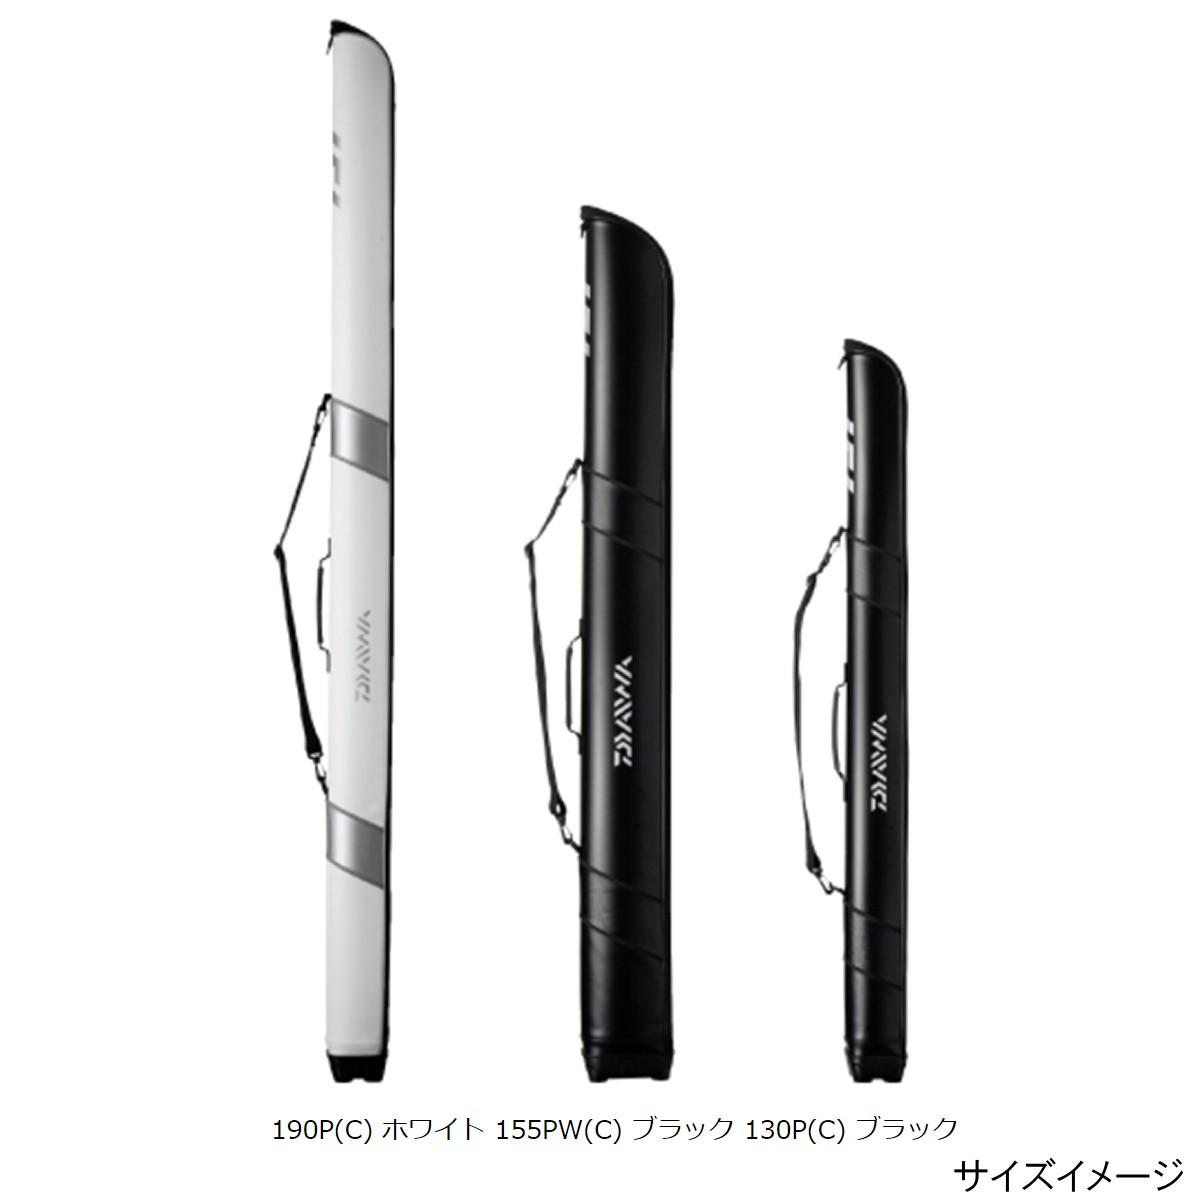 大和(Daiwa)灯鱼竿情况155P(C)黑色